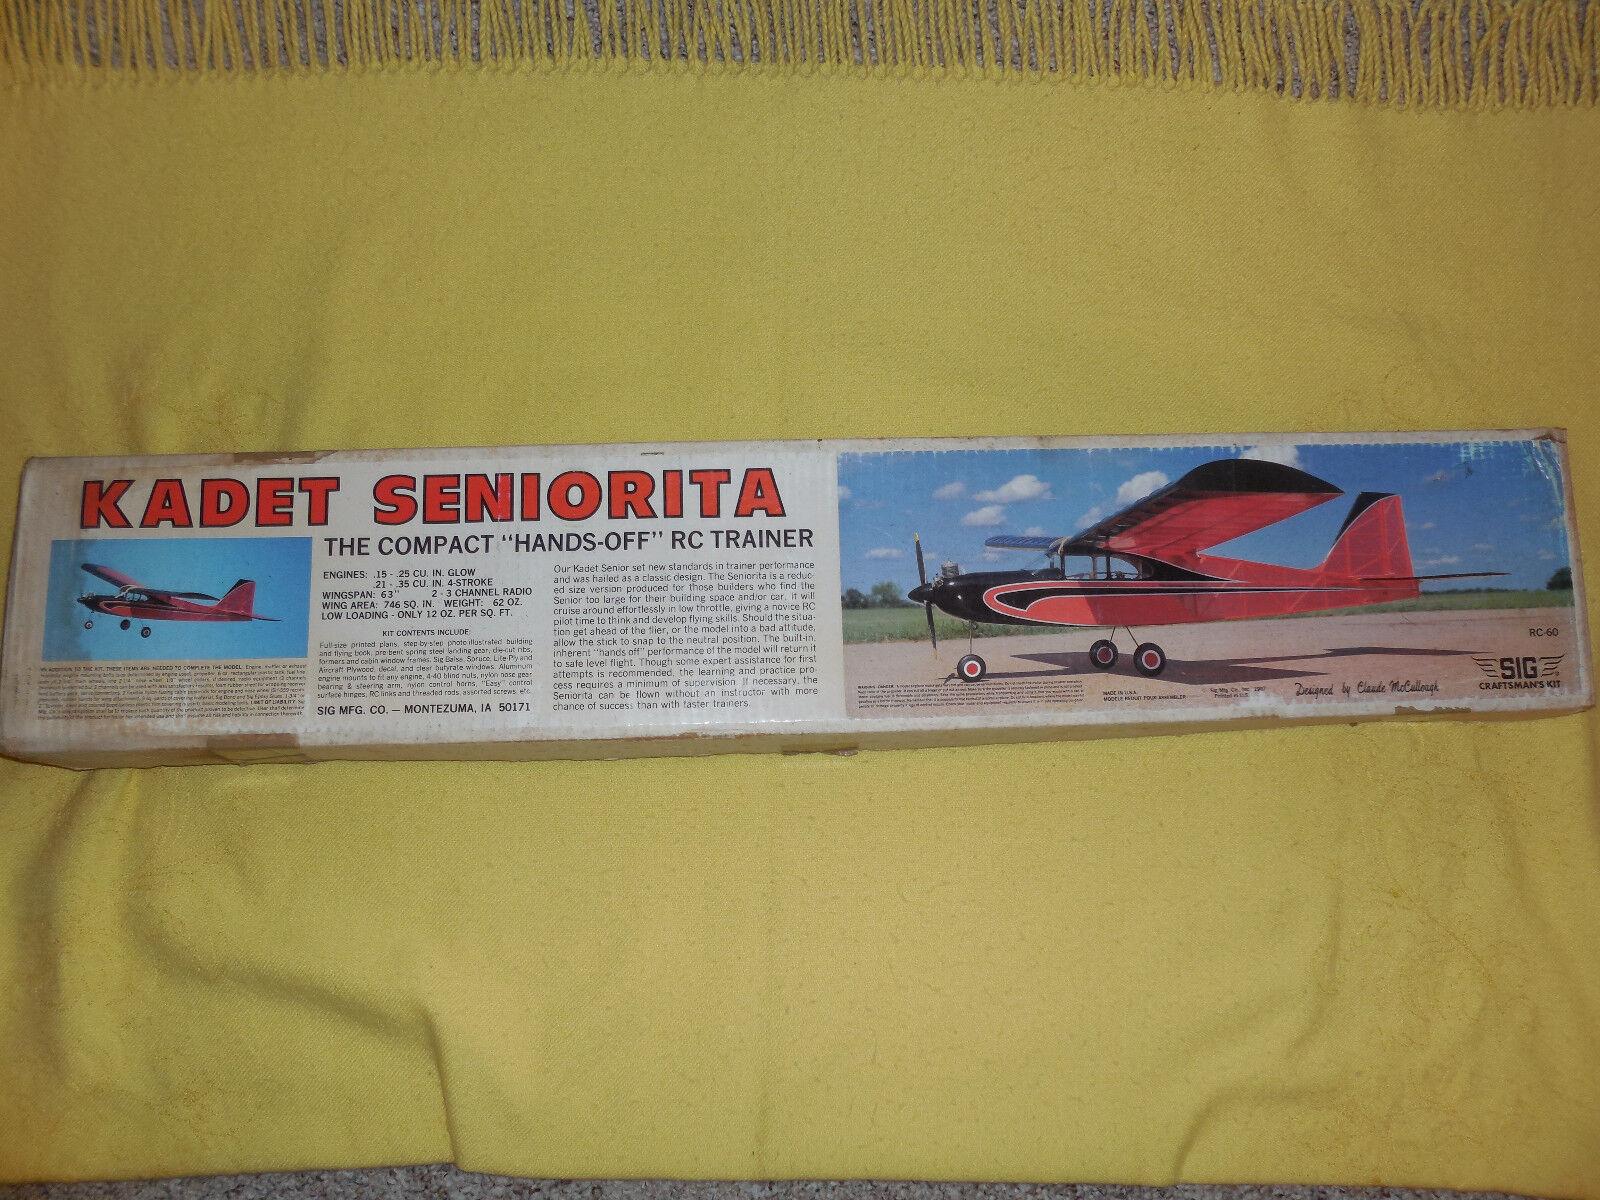 Ein kadett seniorita balsaholz flugzeug - modell